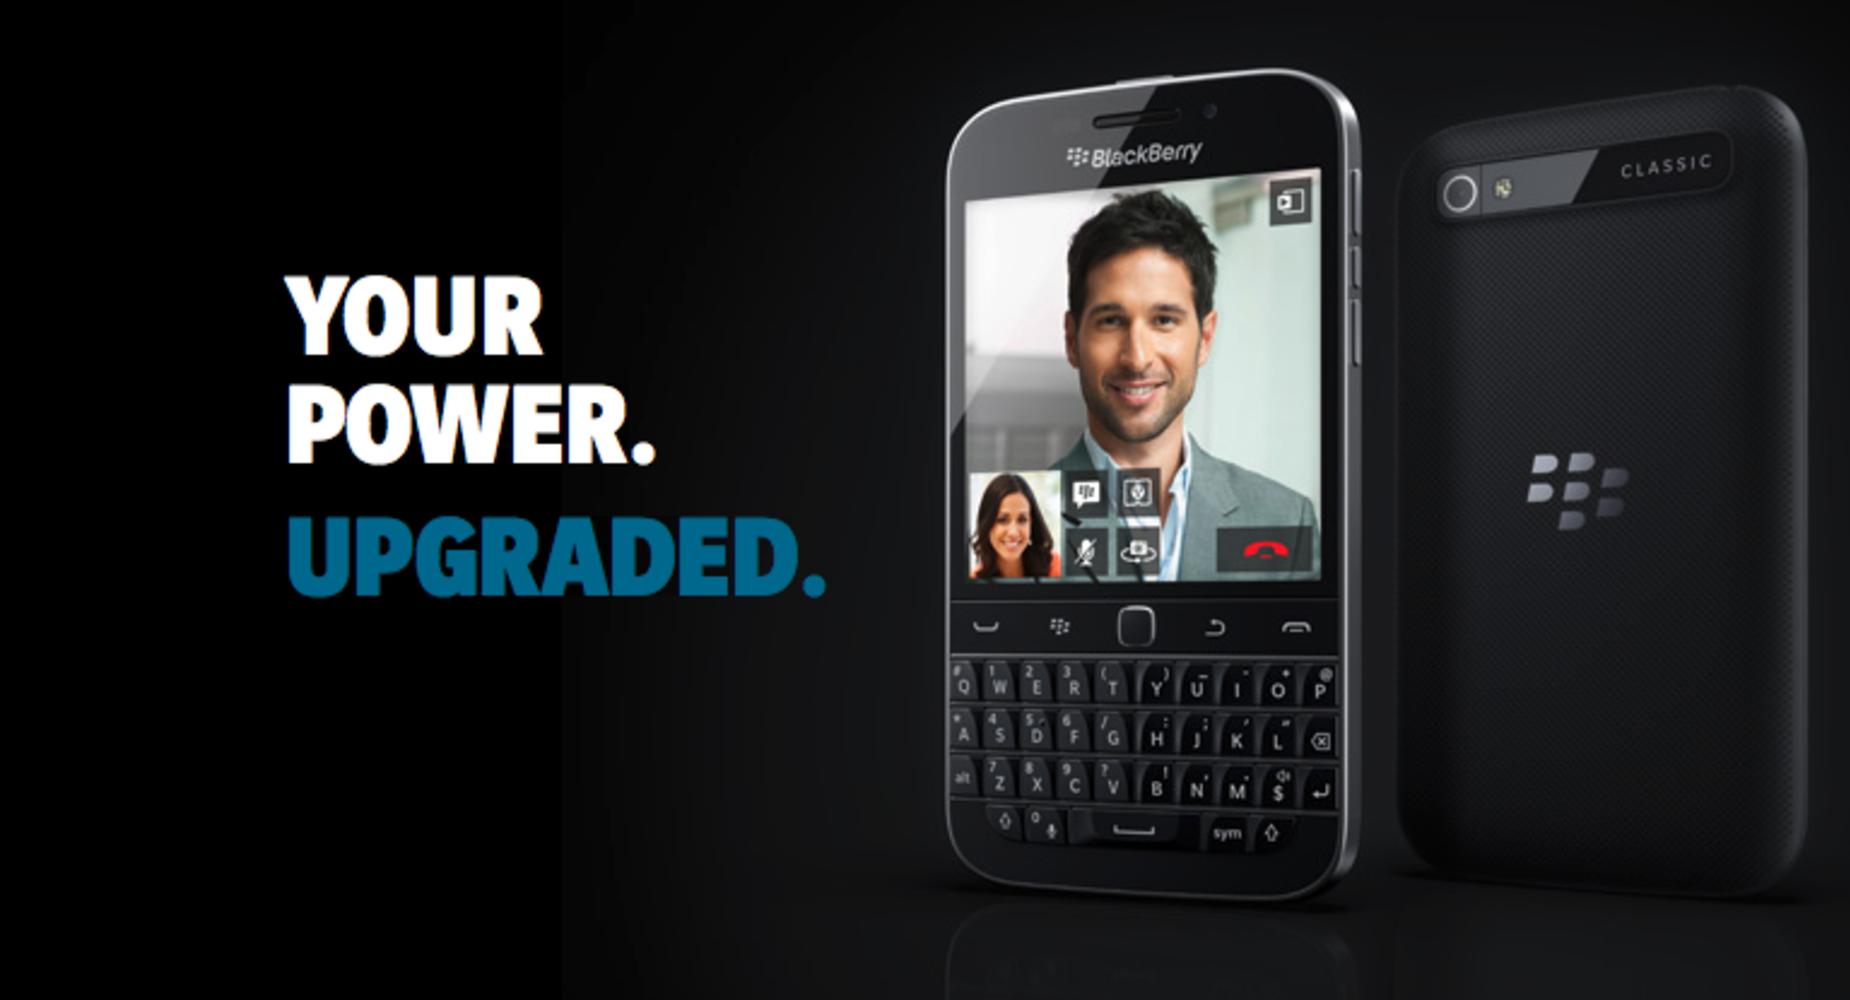 BlackBerry ma kolejny telefon, który mógłby mi zastąpić iPhone'a